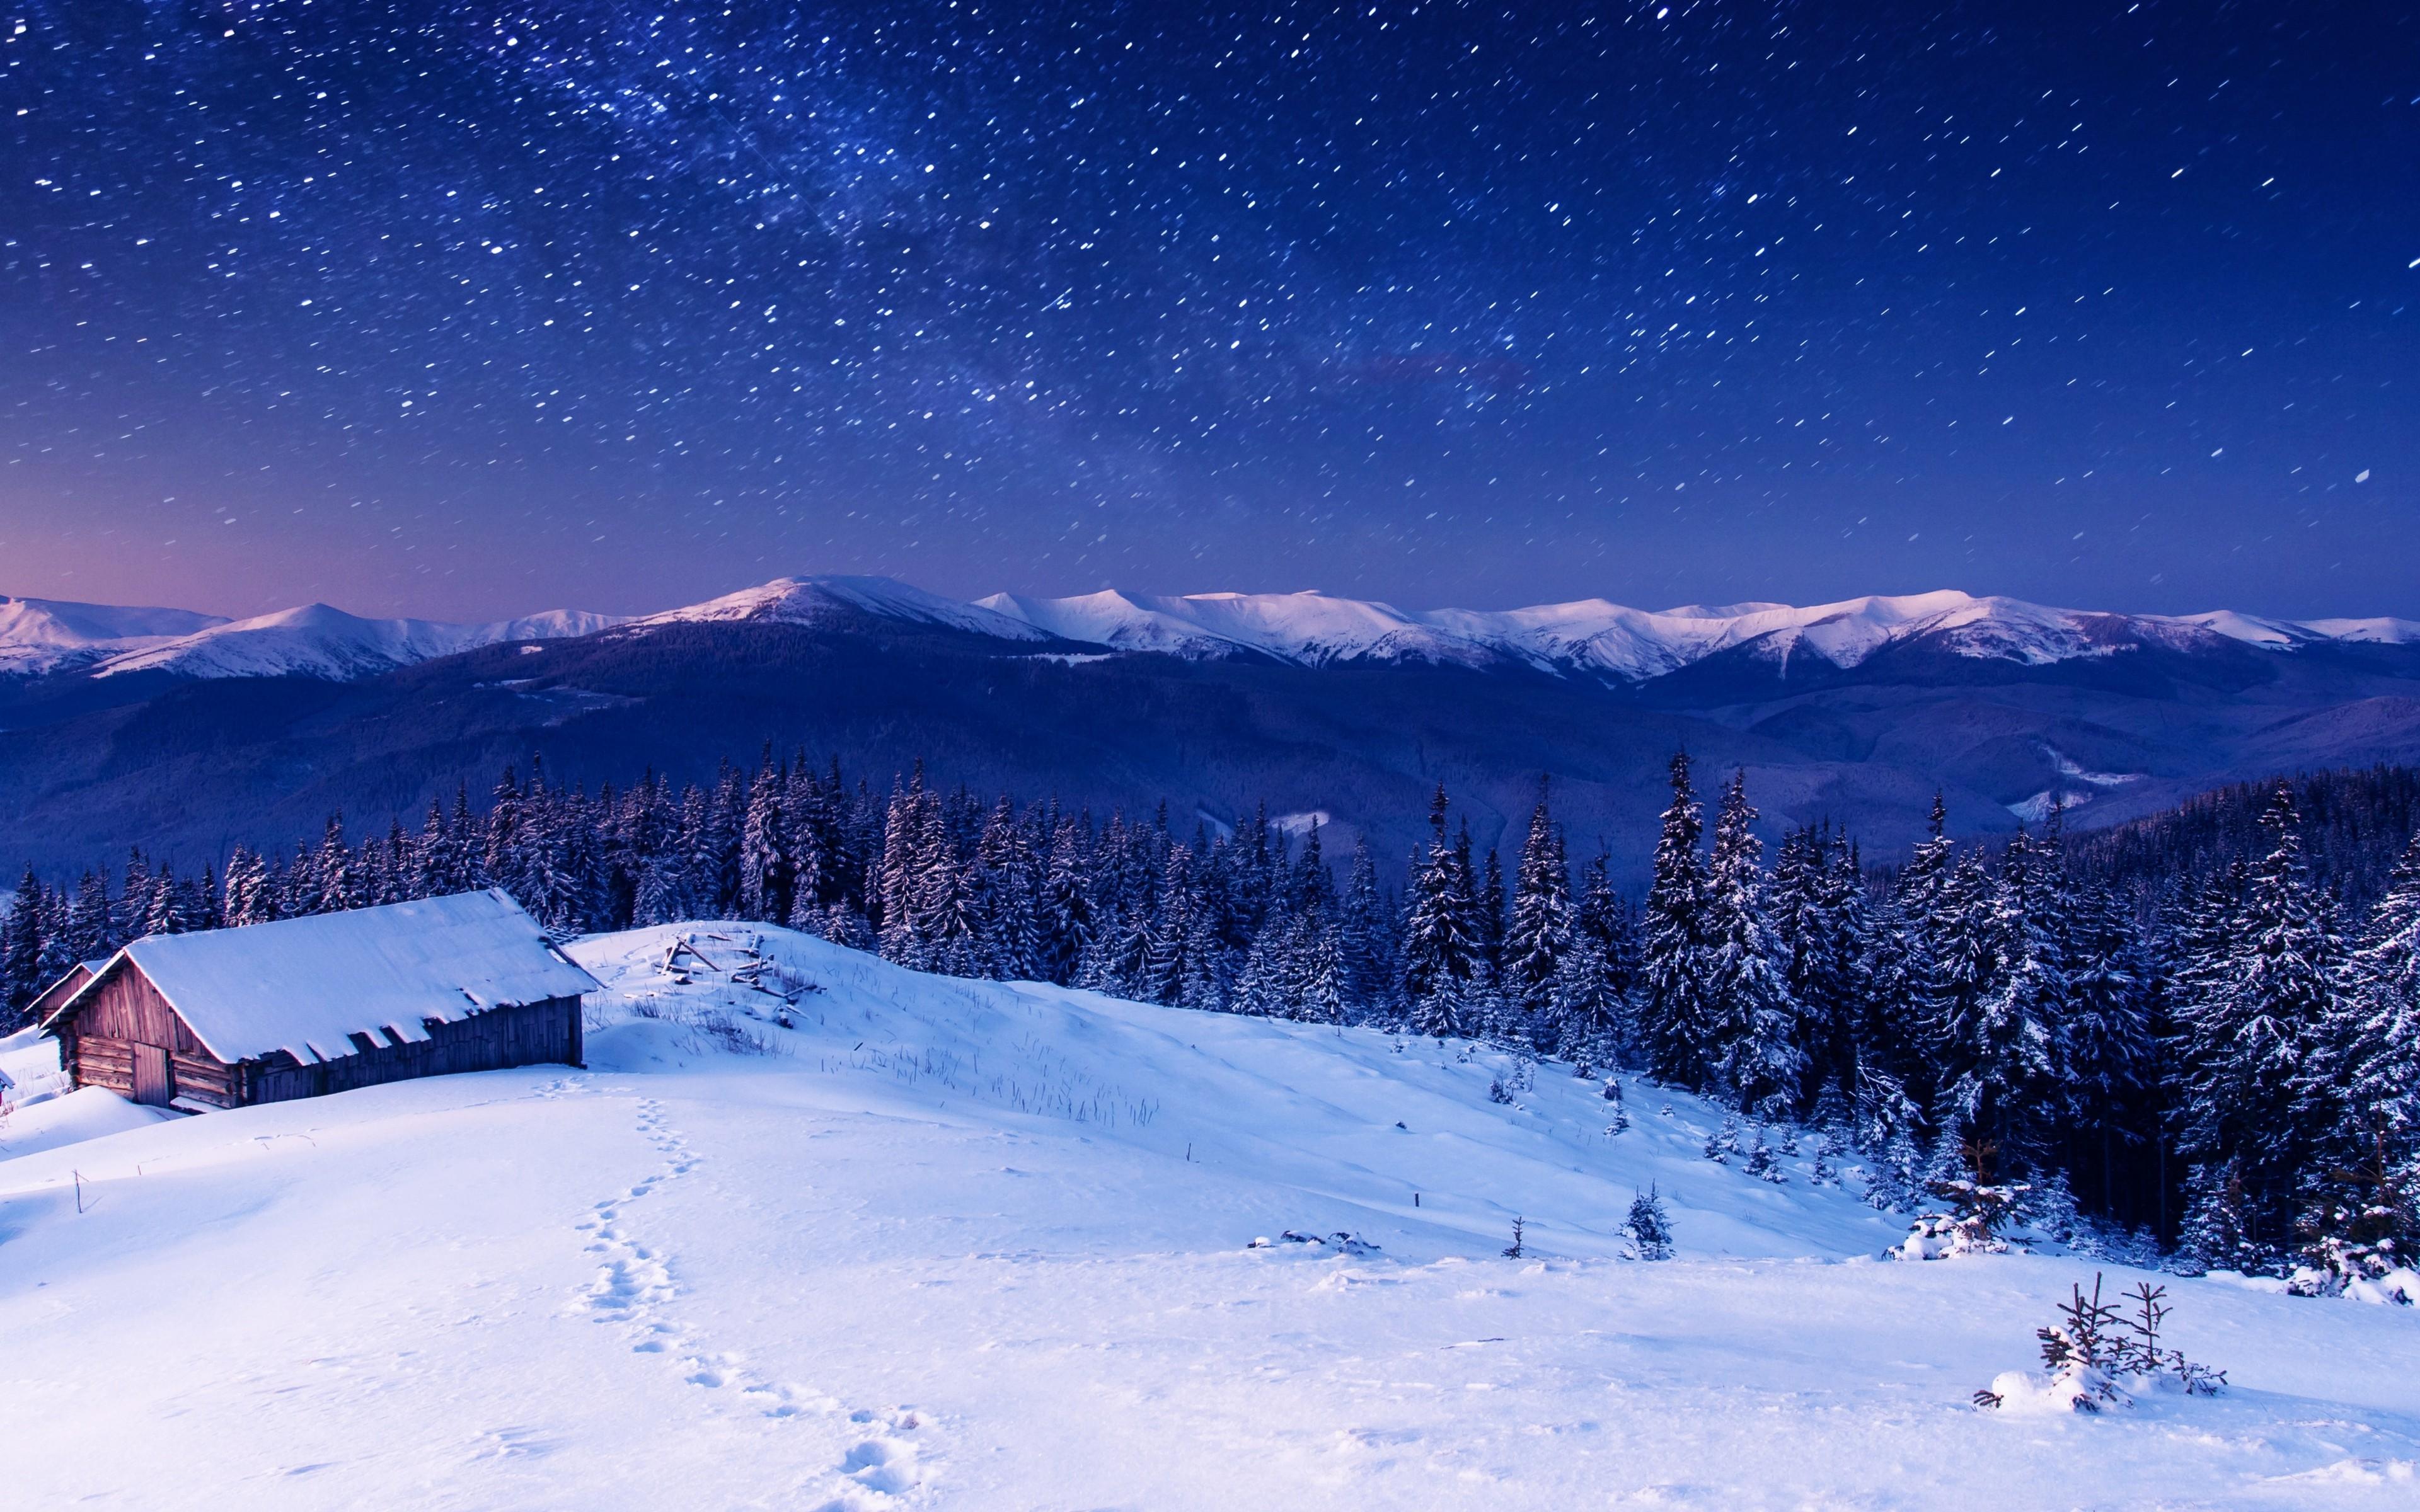 sky winter stars mountains 1574939508 - Sky Winter Stars Mountains -